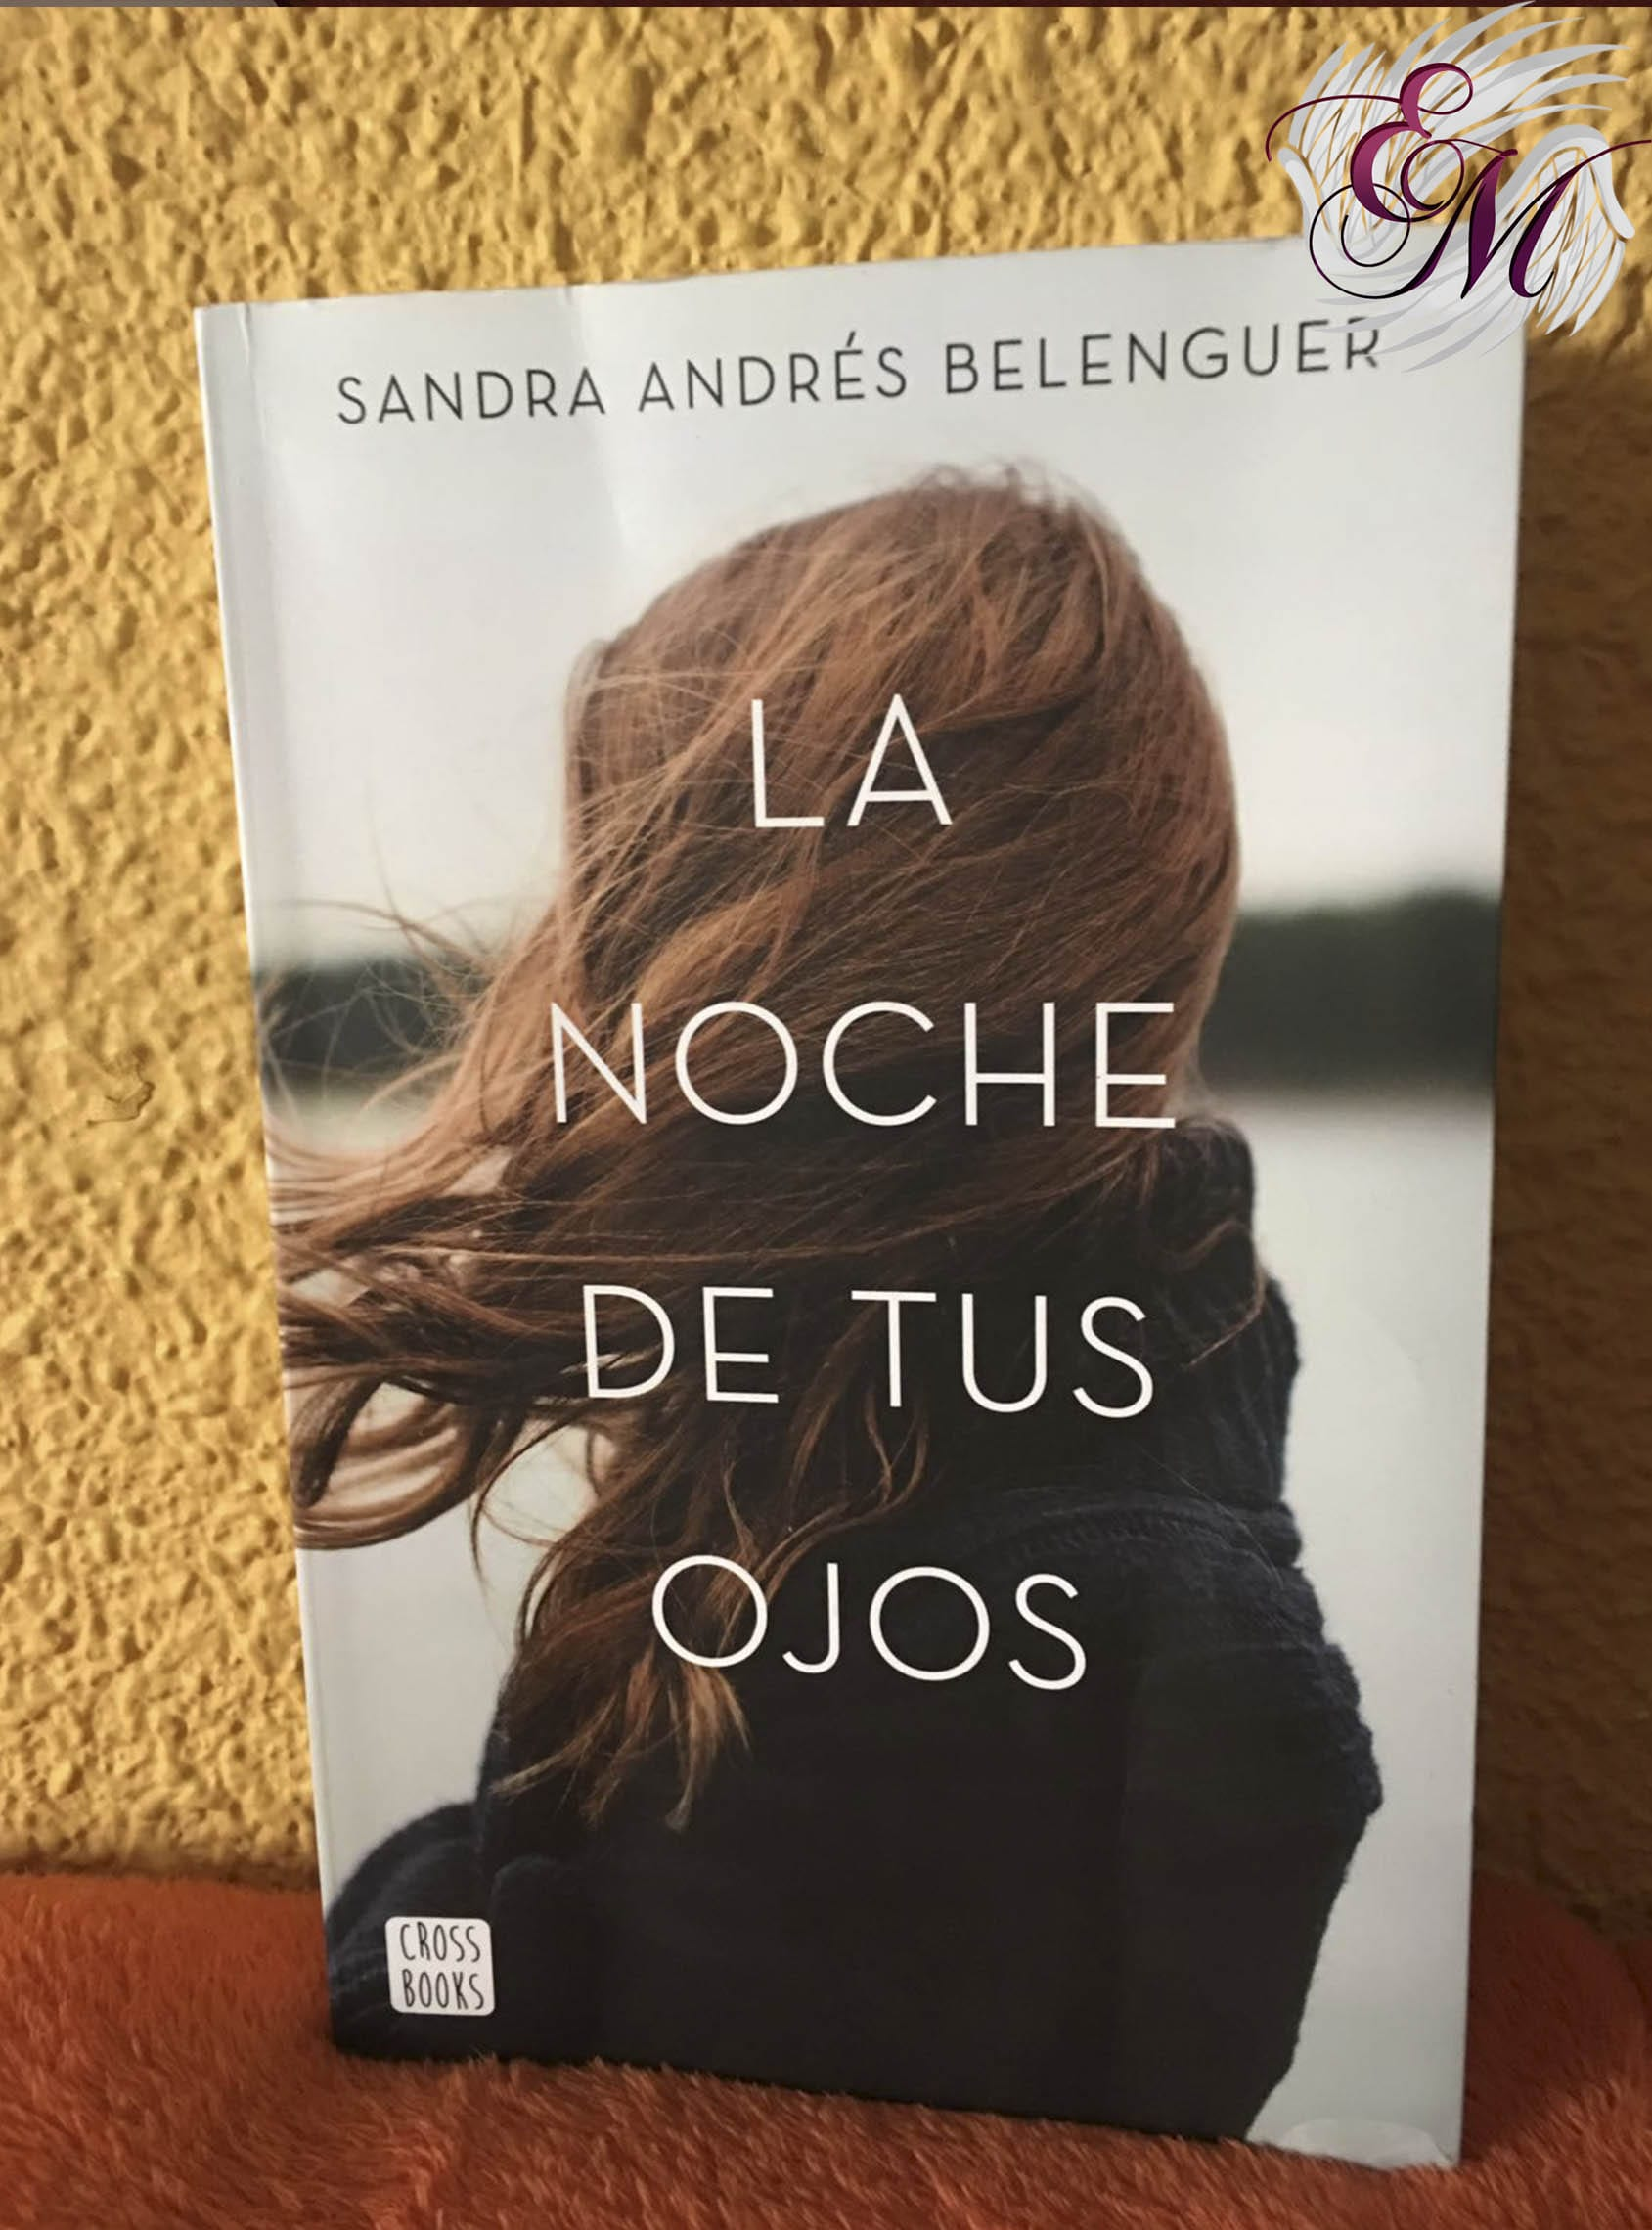 La noche de tus ojos, de Sandra Andrés Belenguer - Reseña